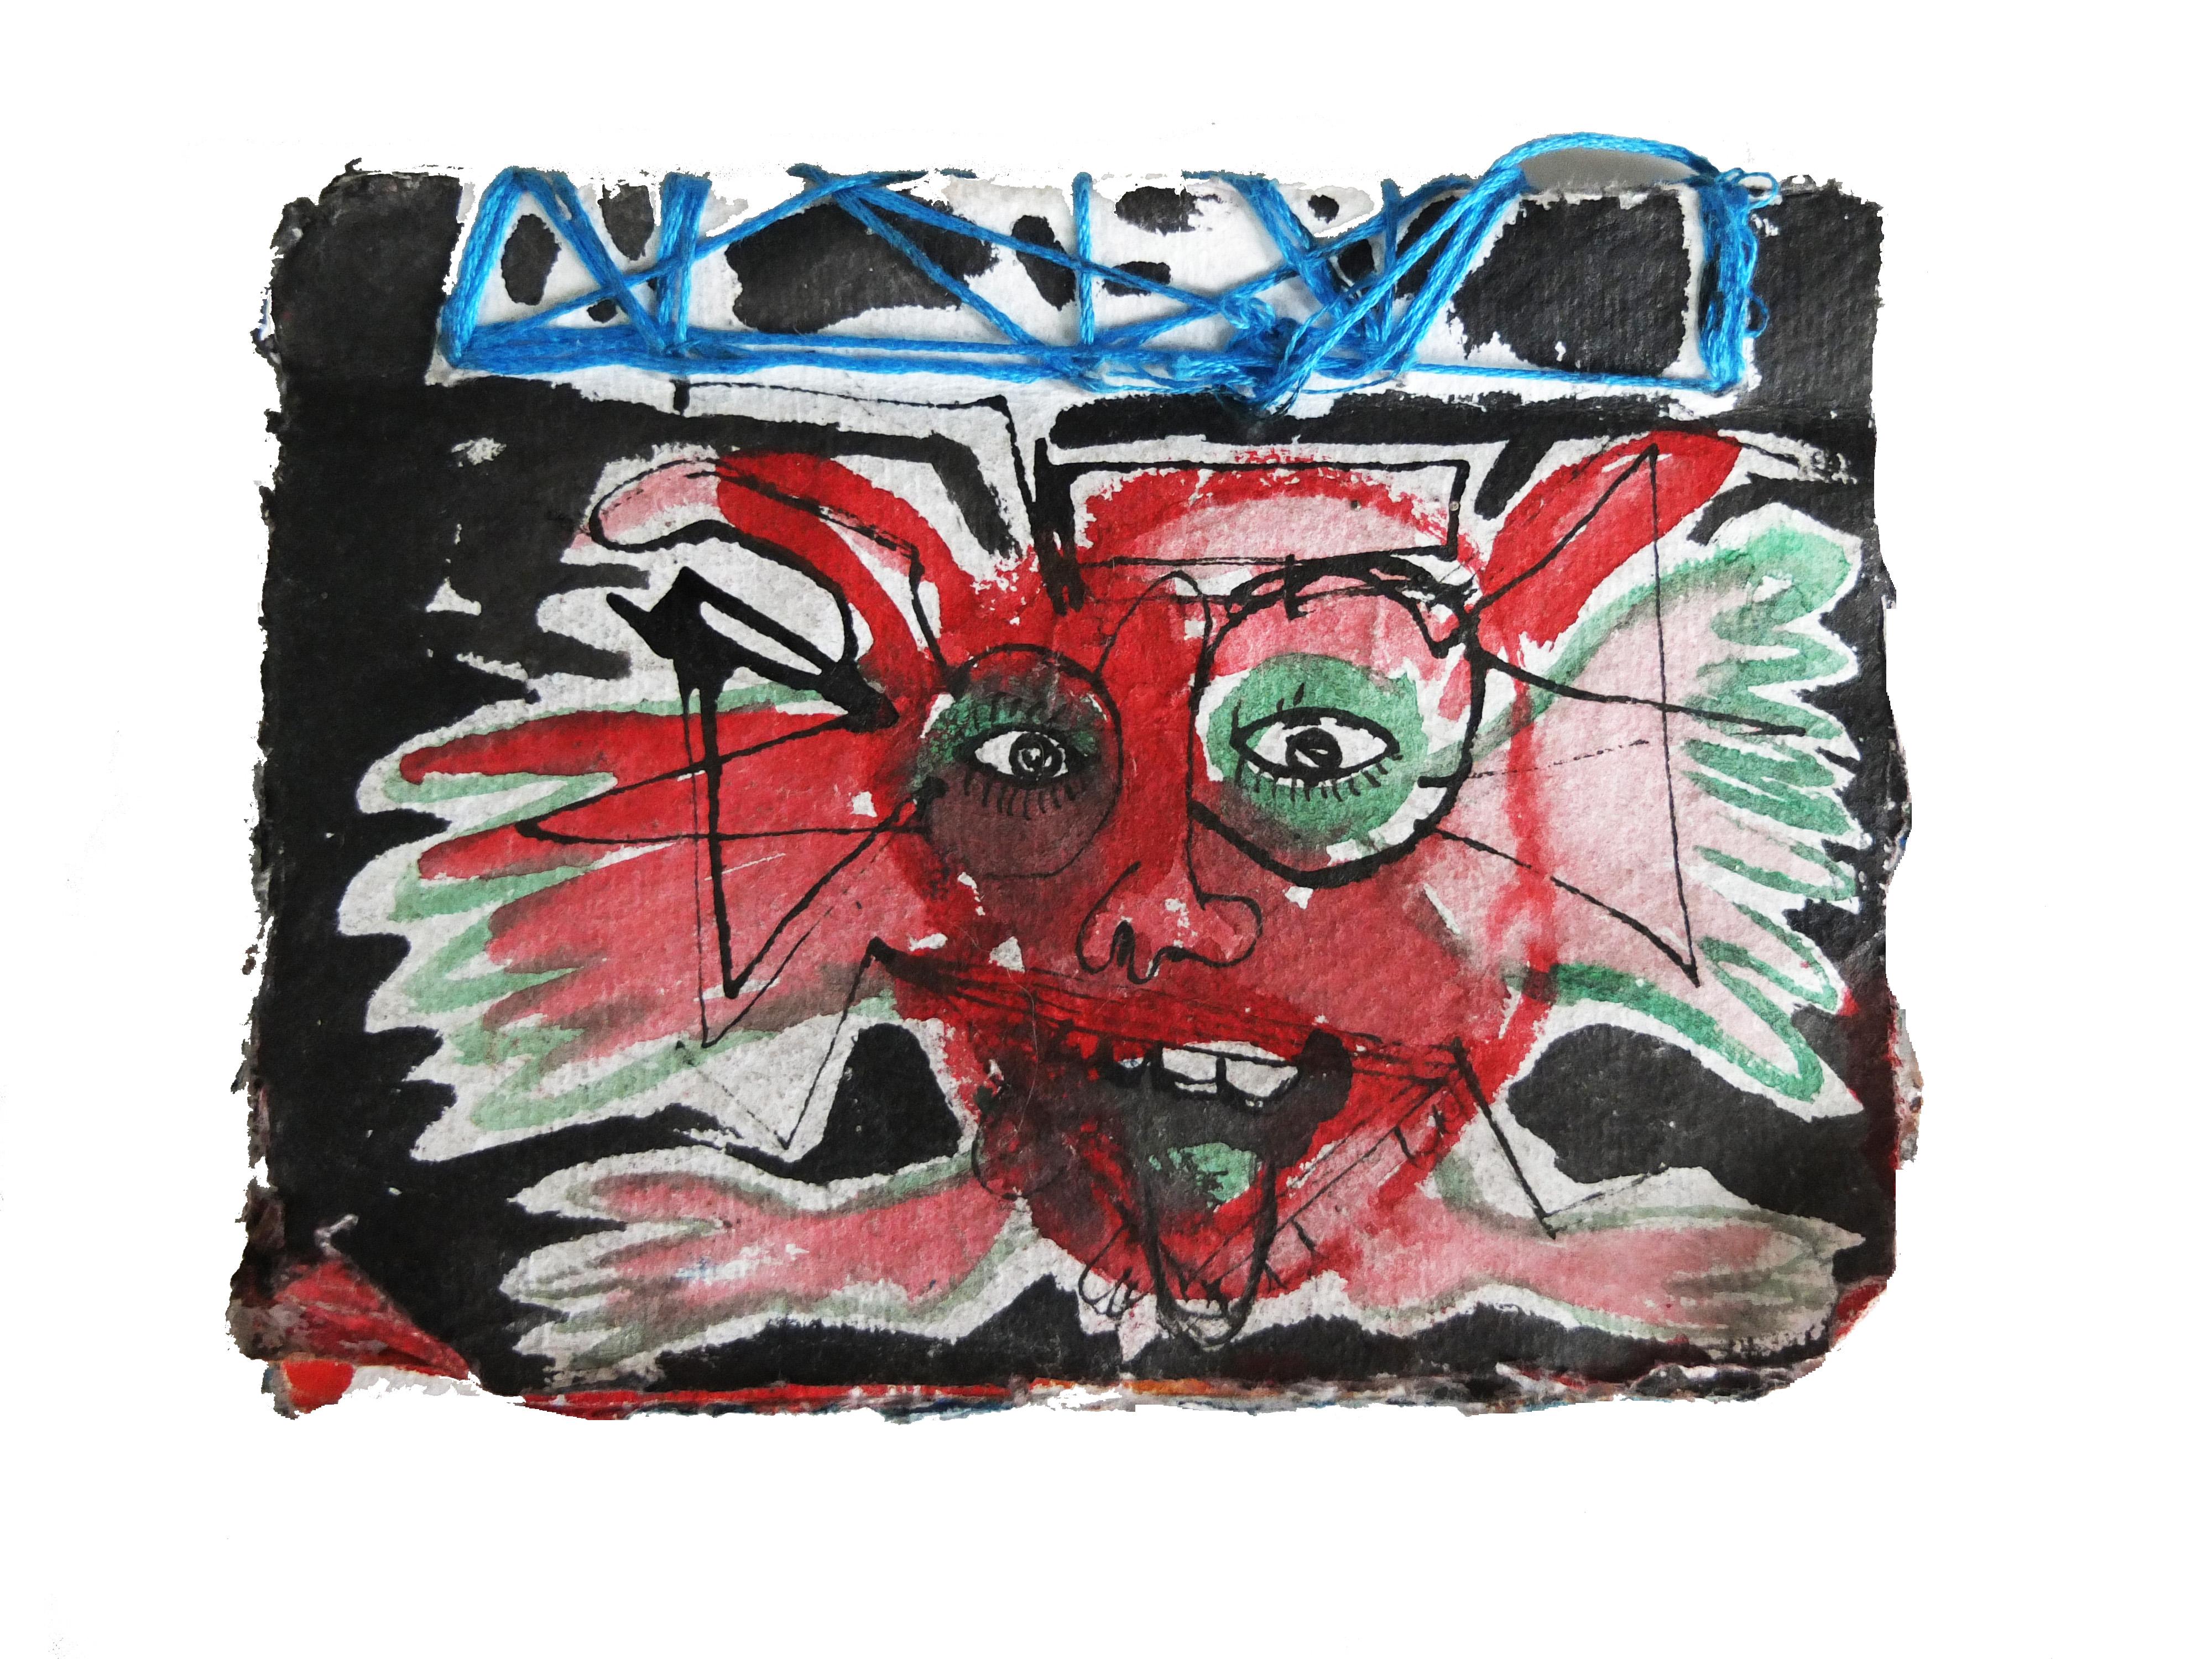 Oaxaca. handmade book using handmade paper. 12cm x 16cm